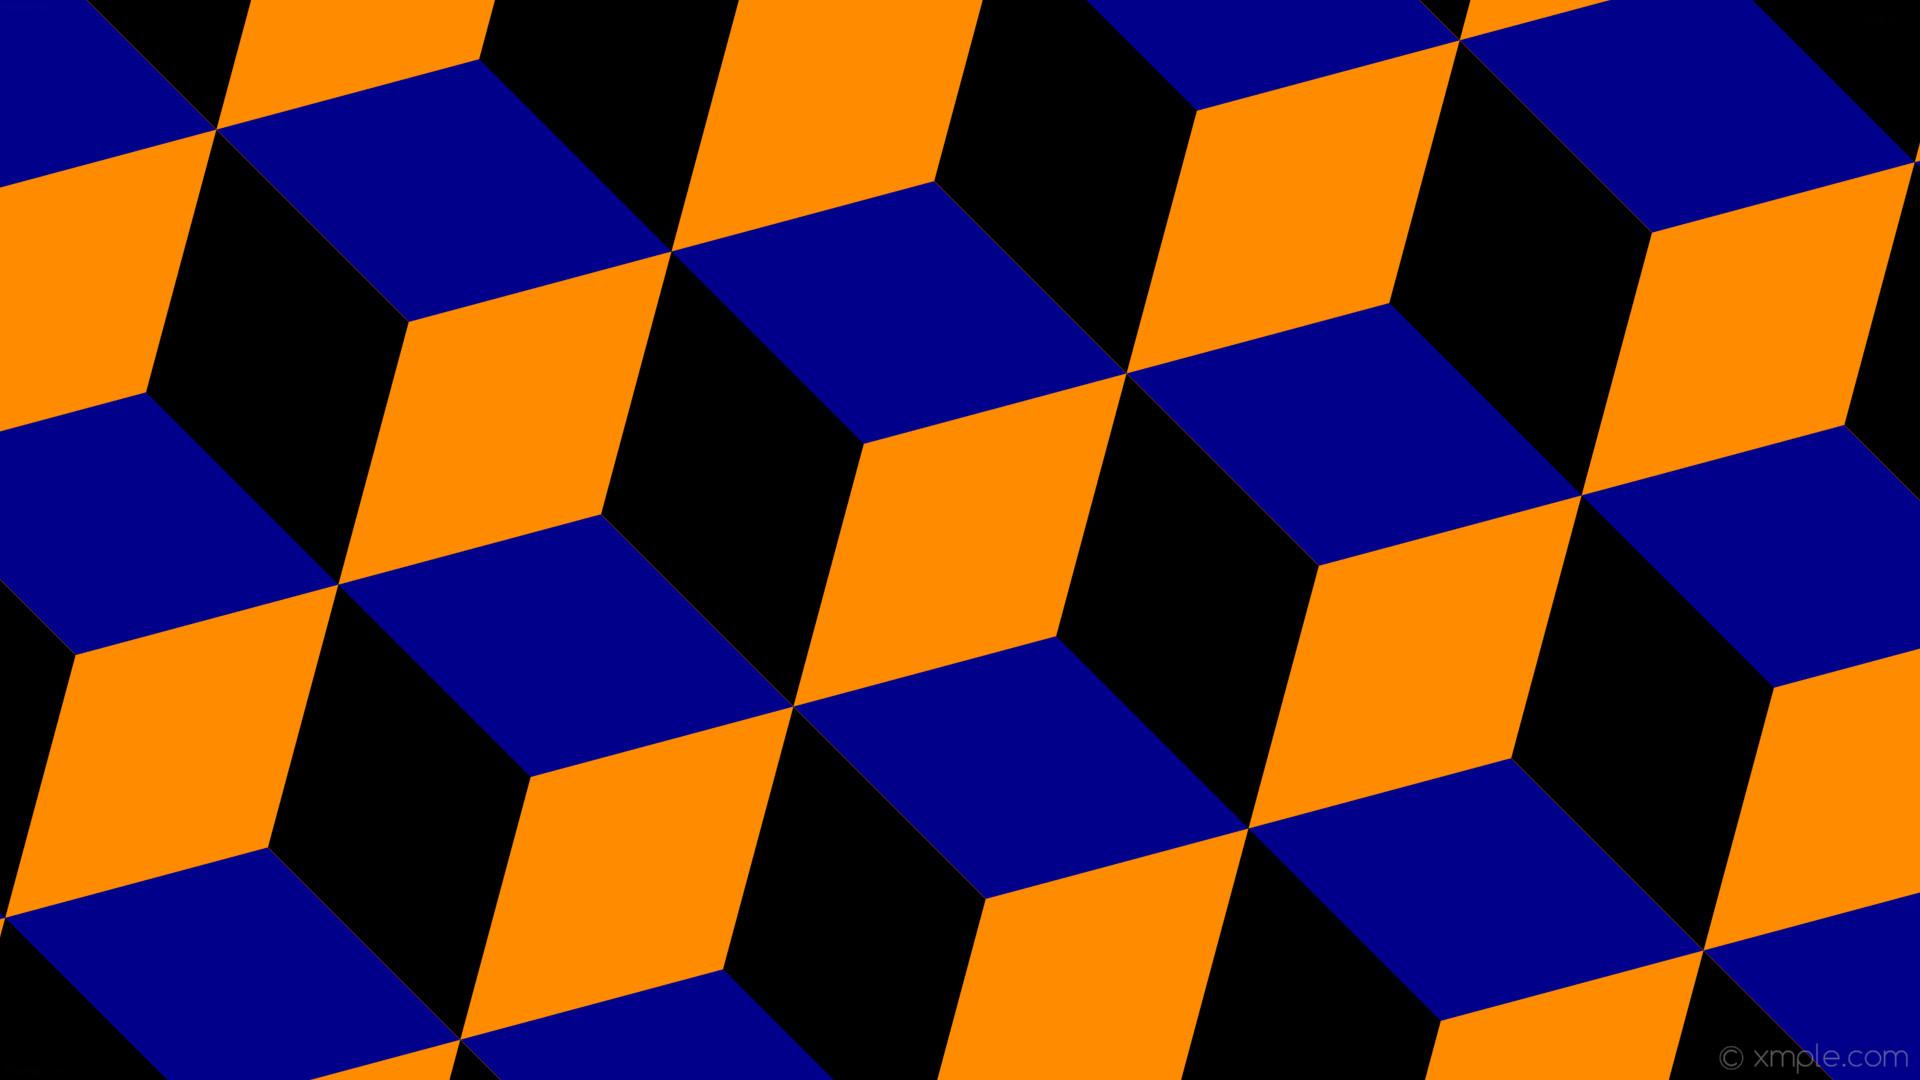 Blue And Orange Wallpaper 77 Images